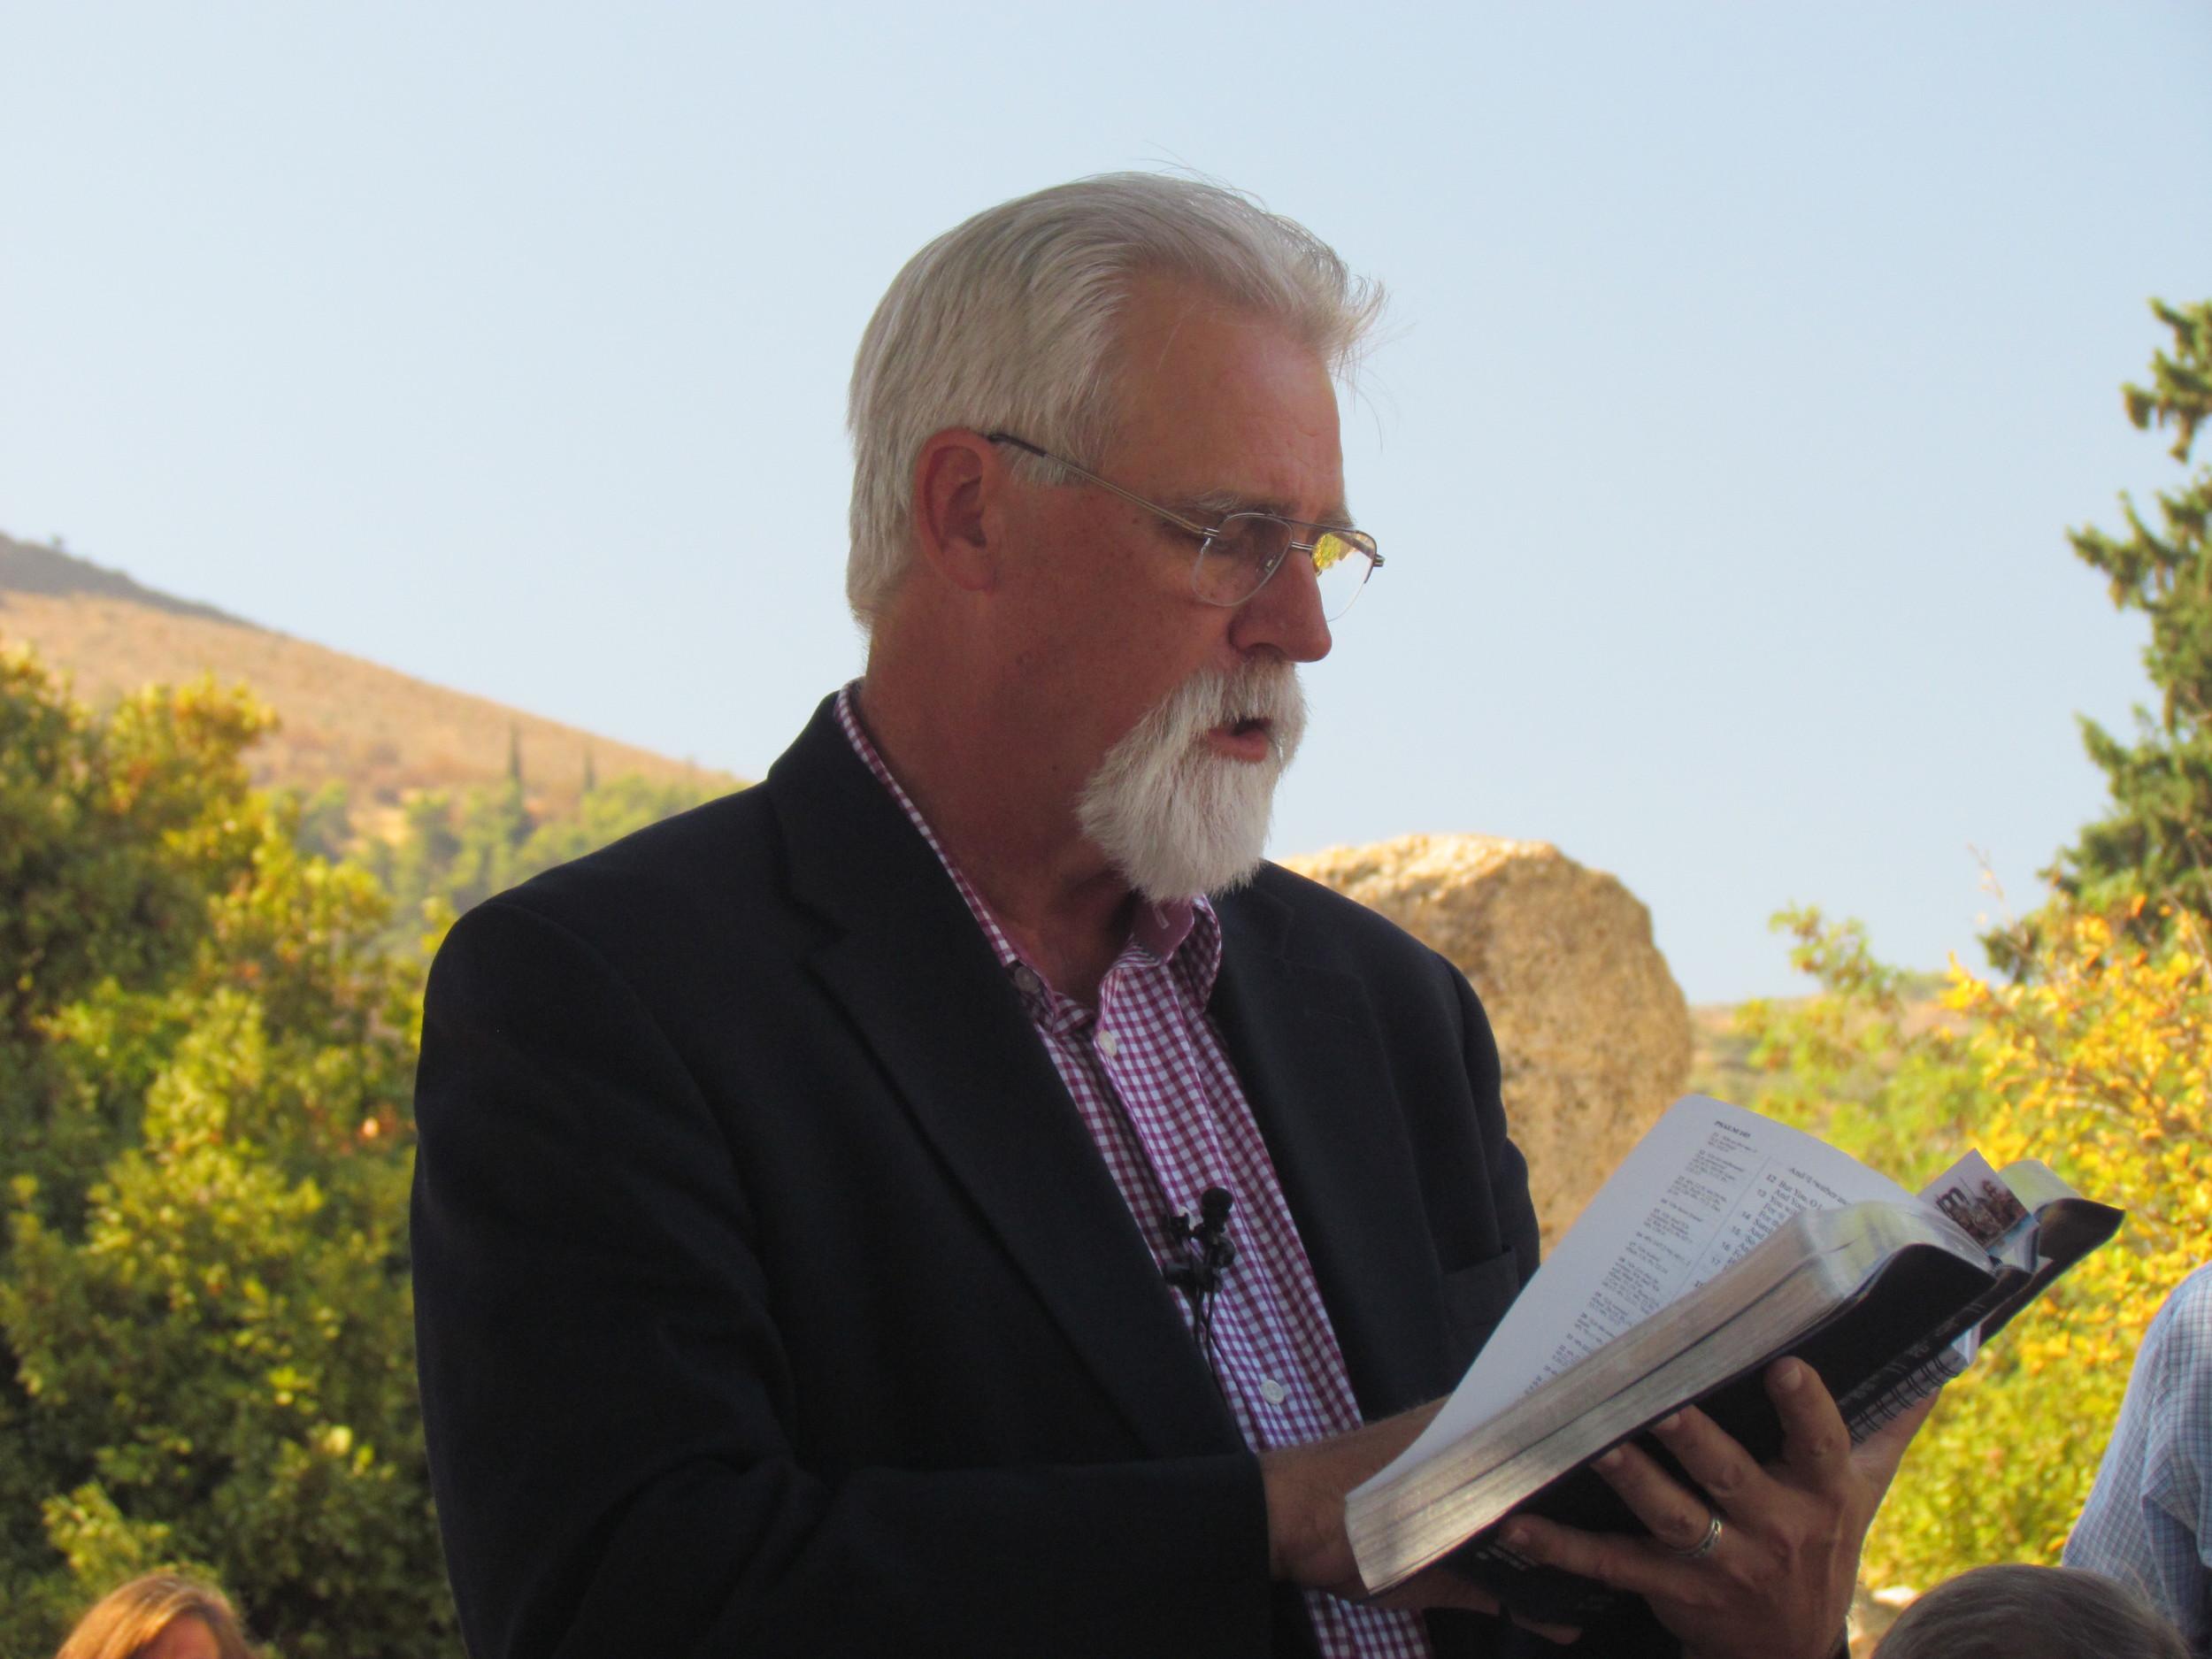 Corinth_Sabbath Service 5_Bill Potter.JPG